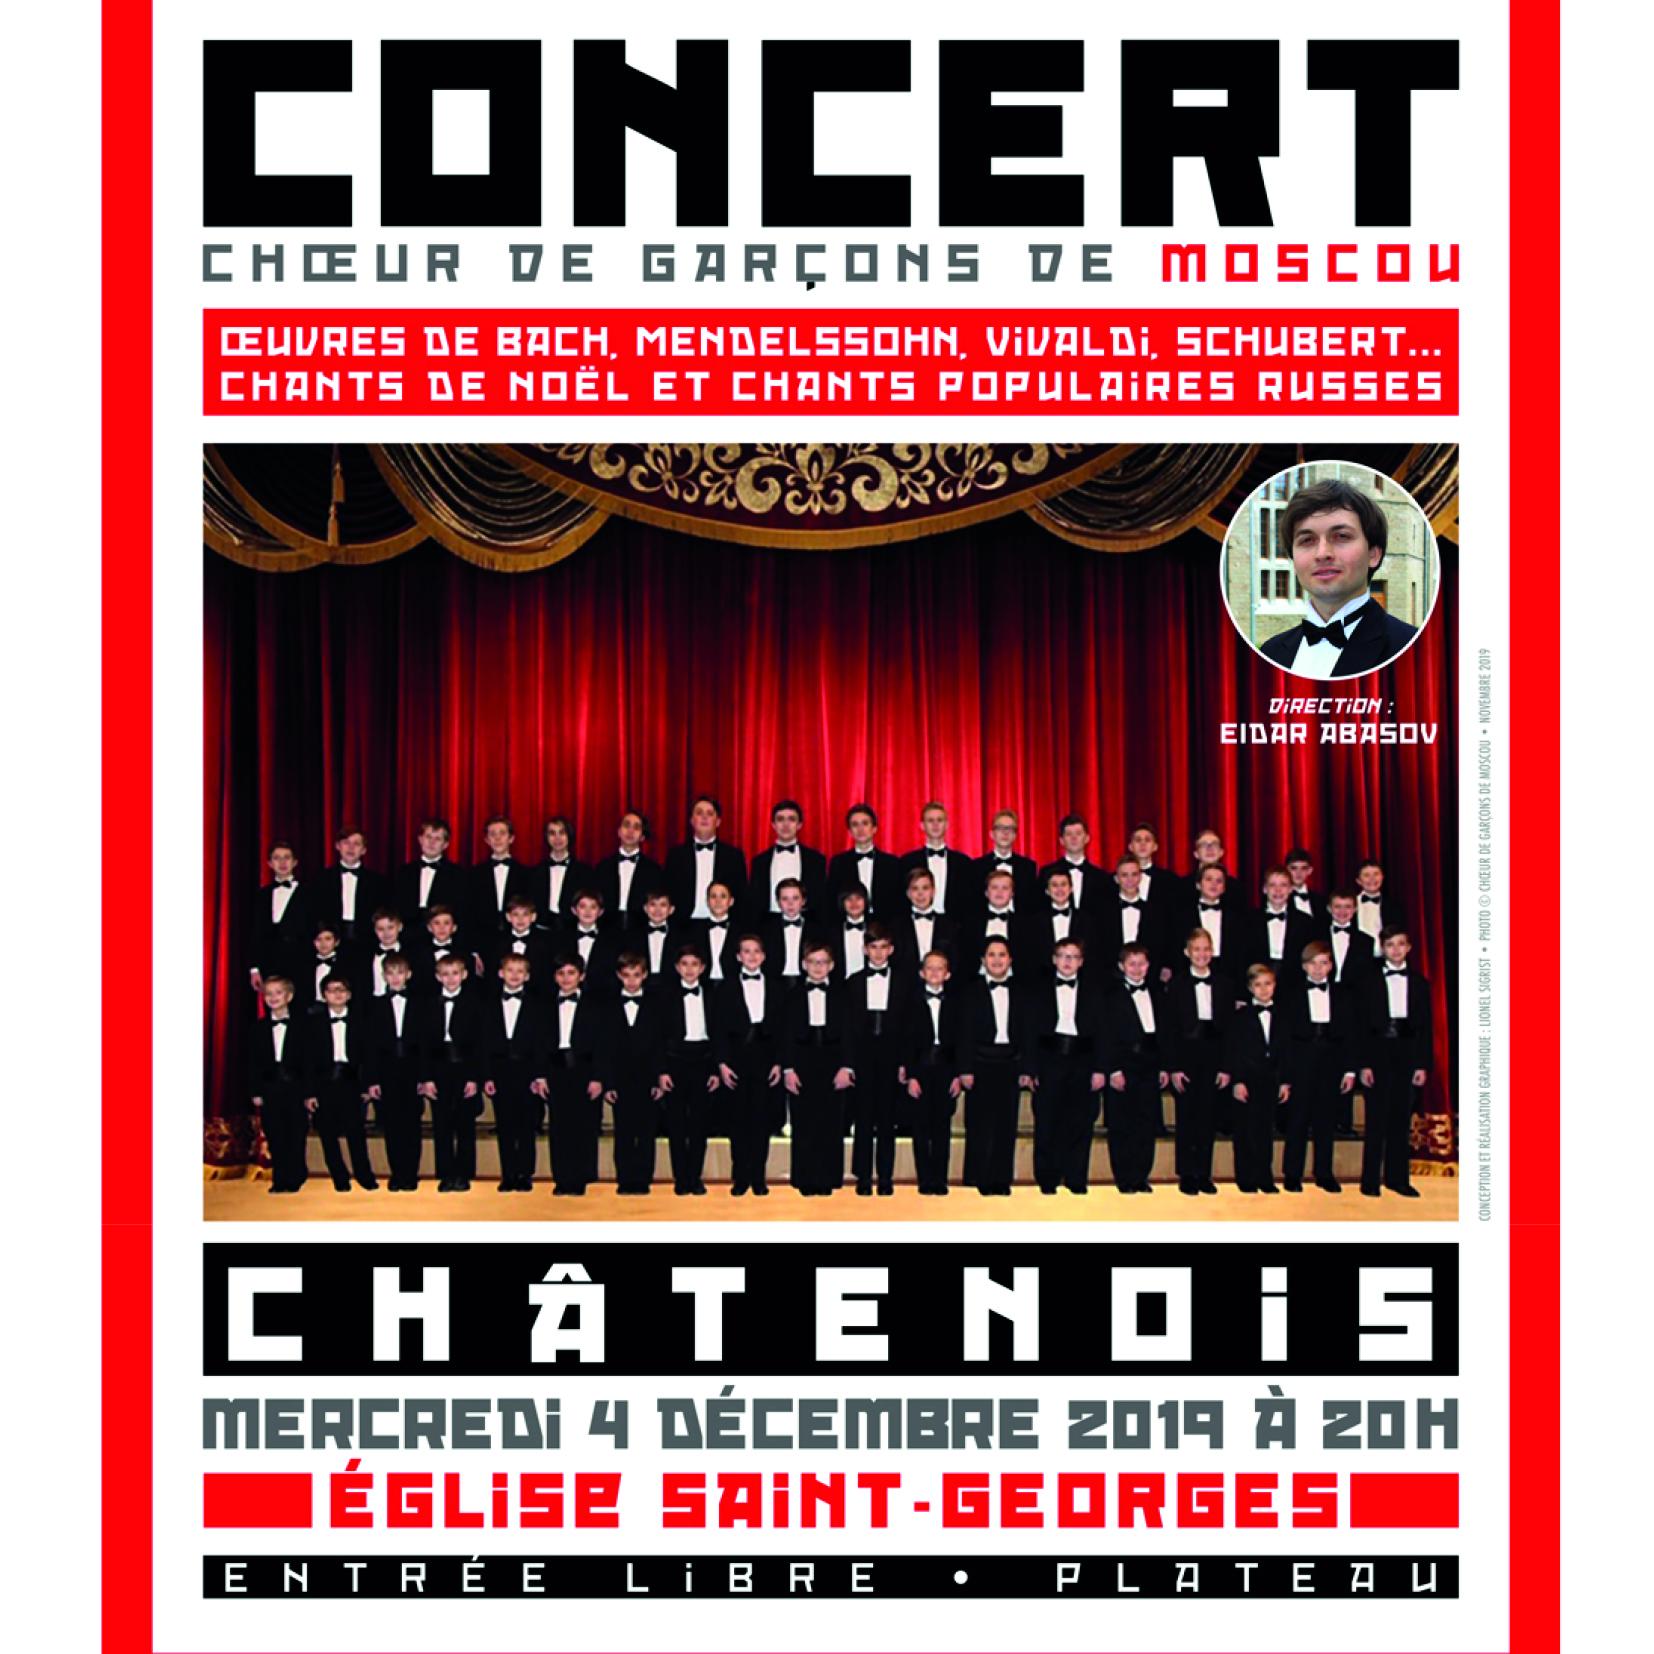 Concert choeur moscou